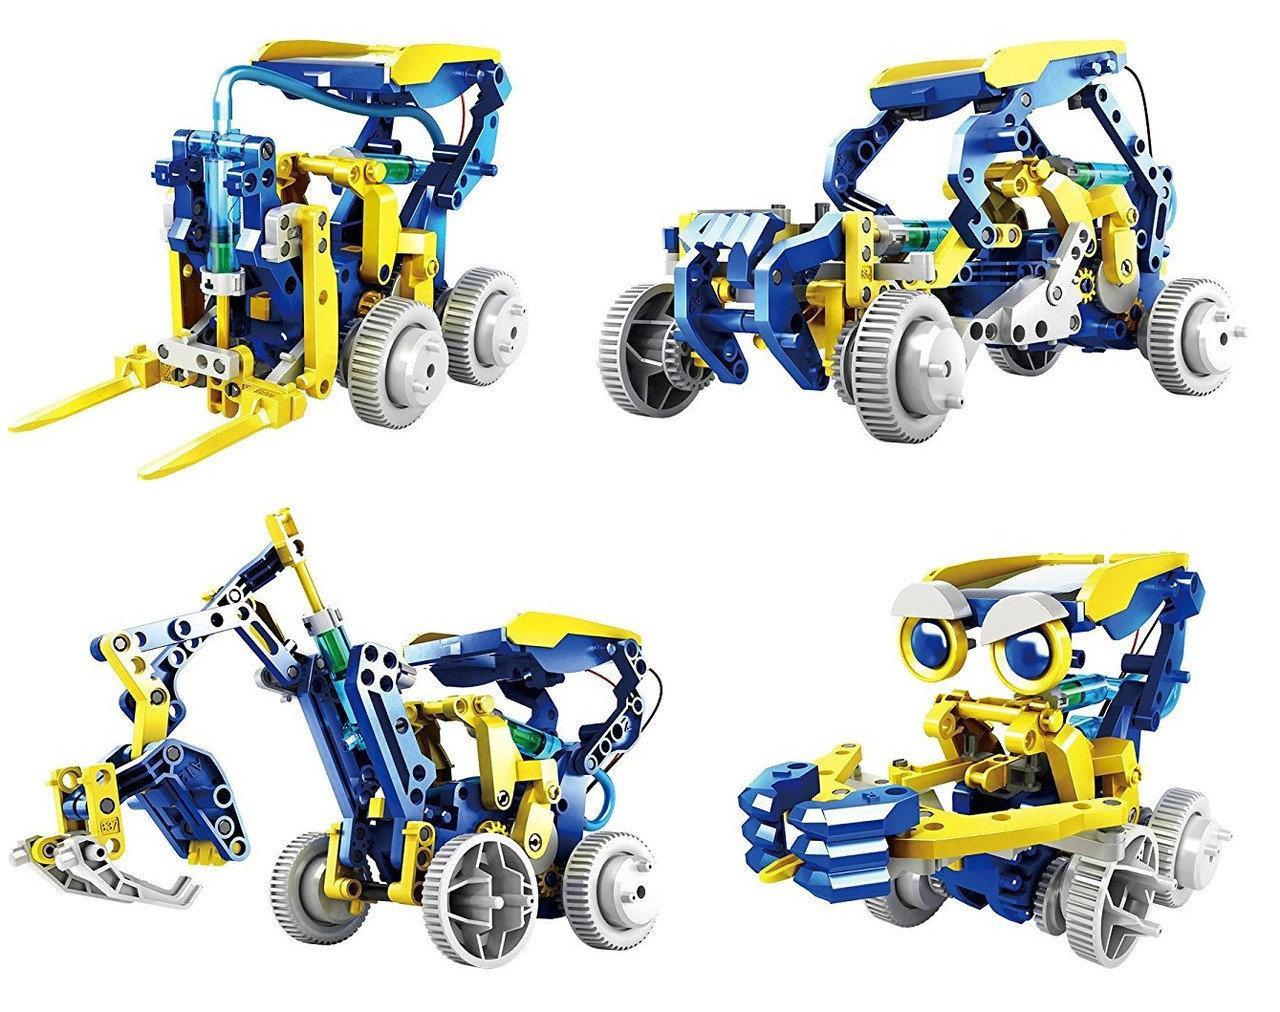 1948879964_w640_h640_robot_konstruktor.jpg